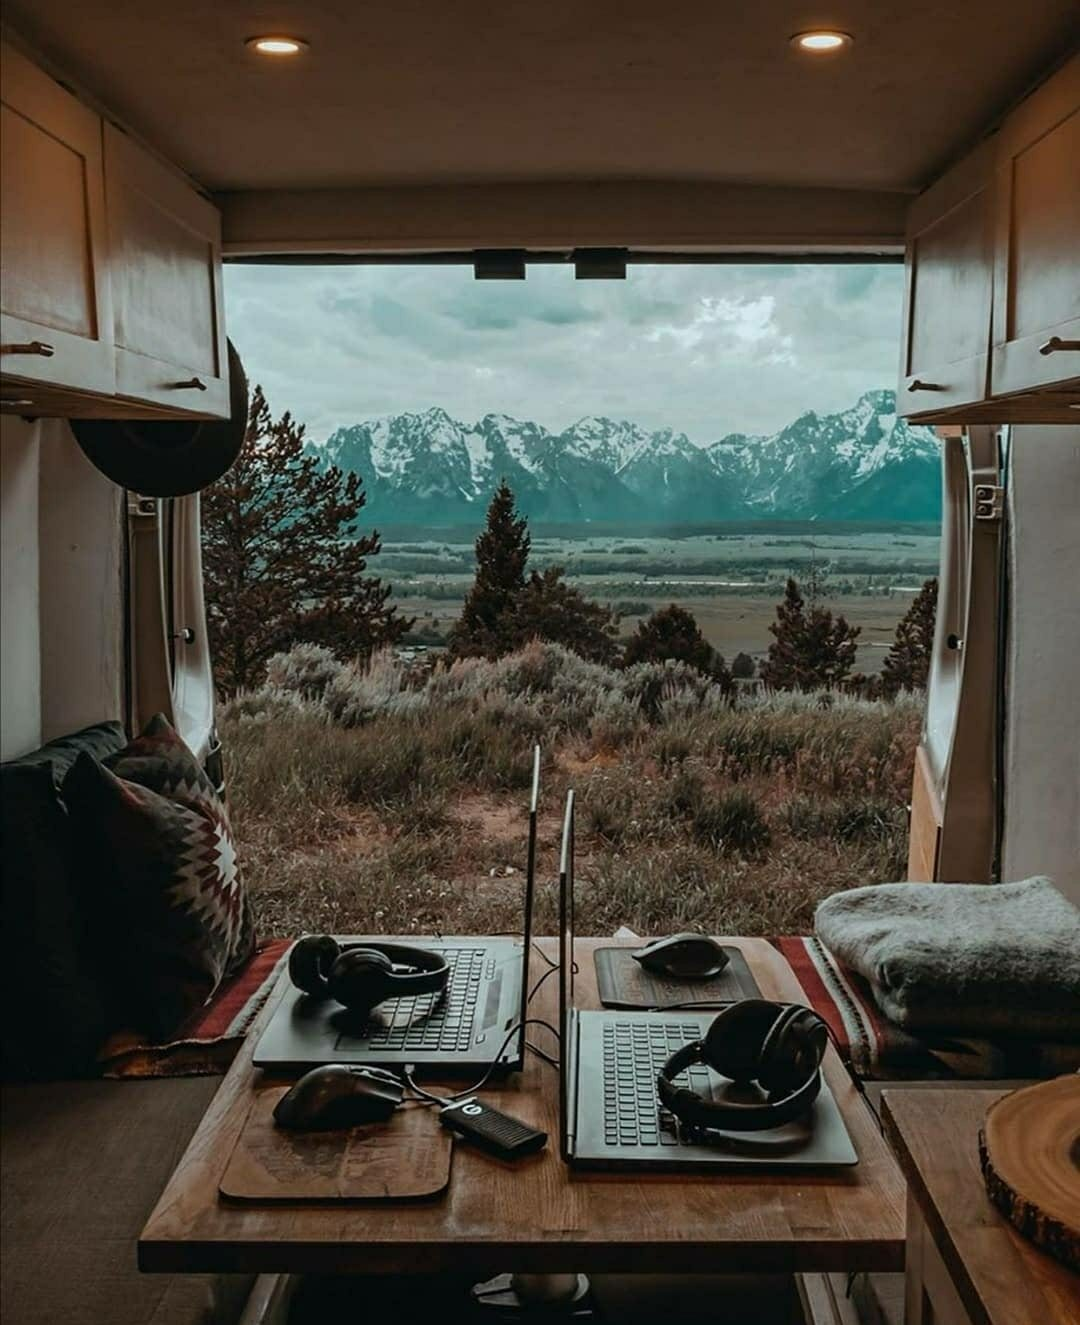 nomad camper in wilderness